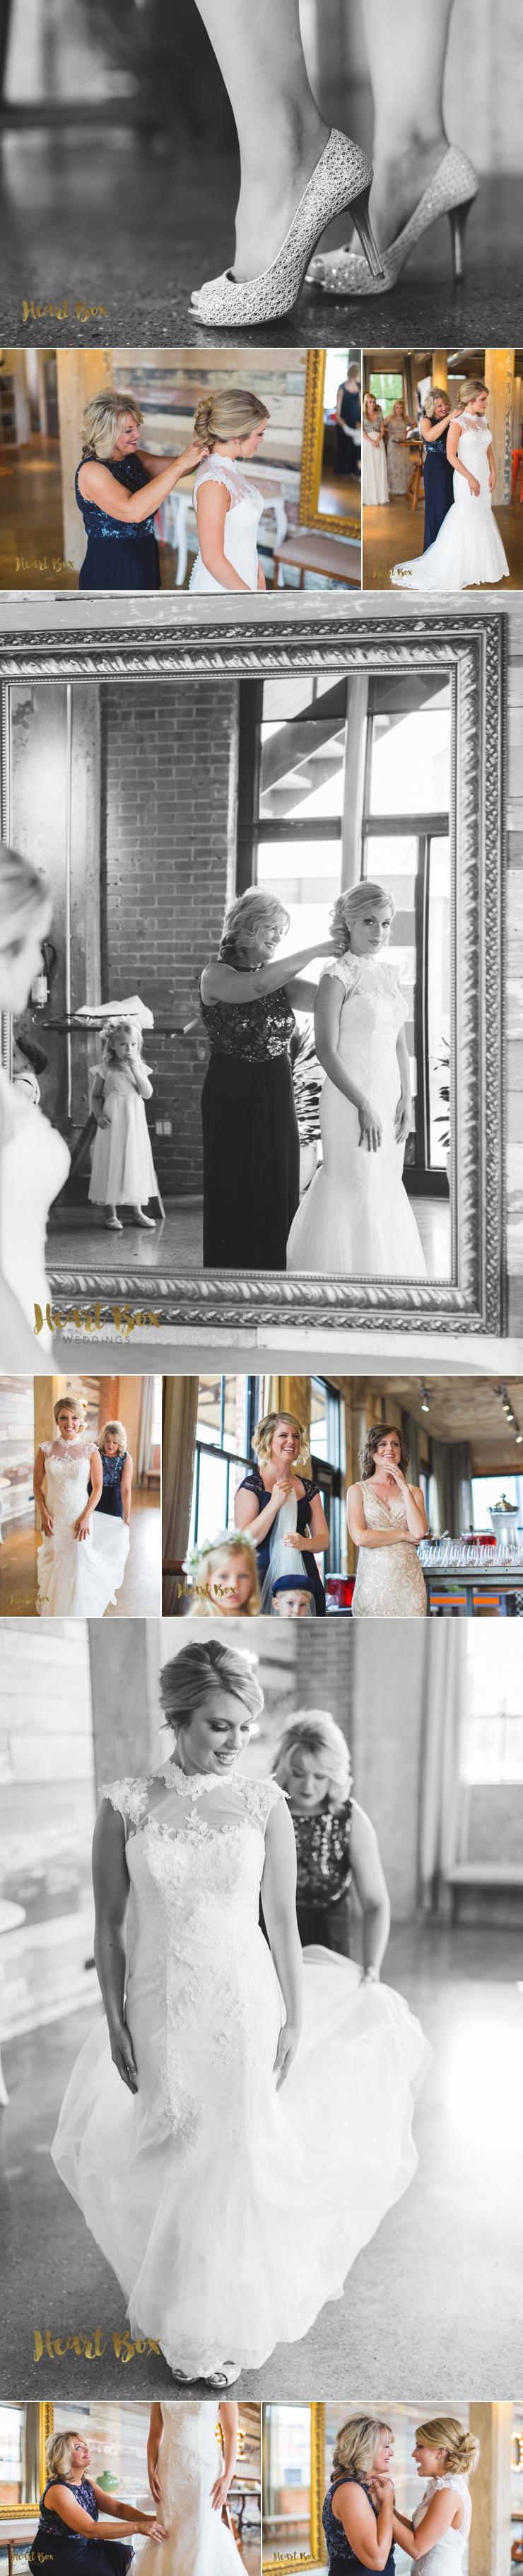 Mabry Wedding 7.jpg